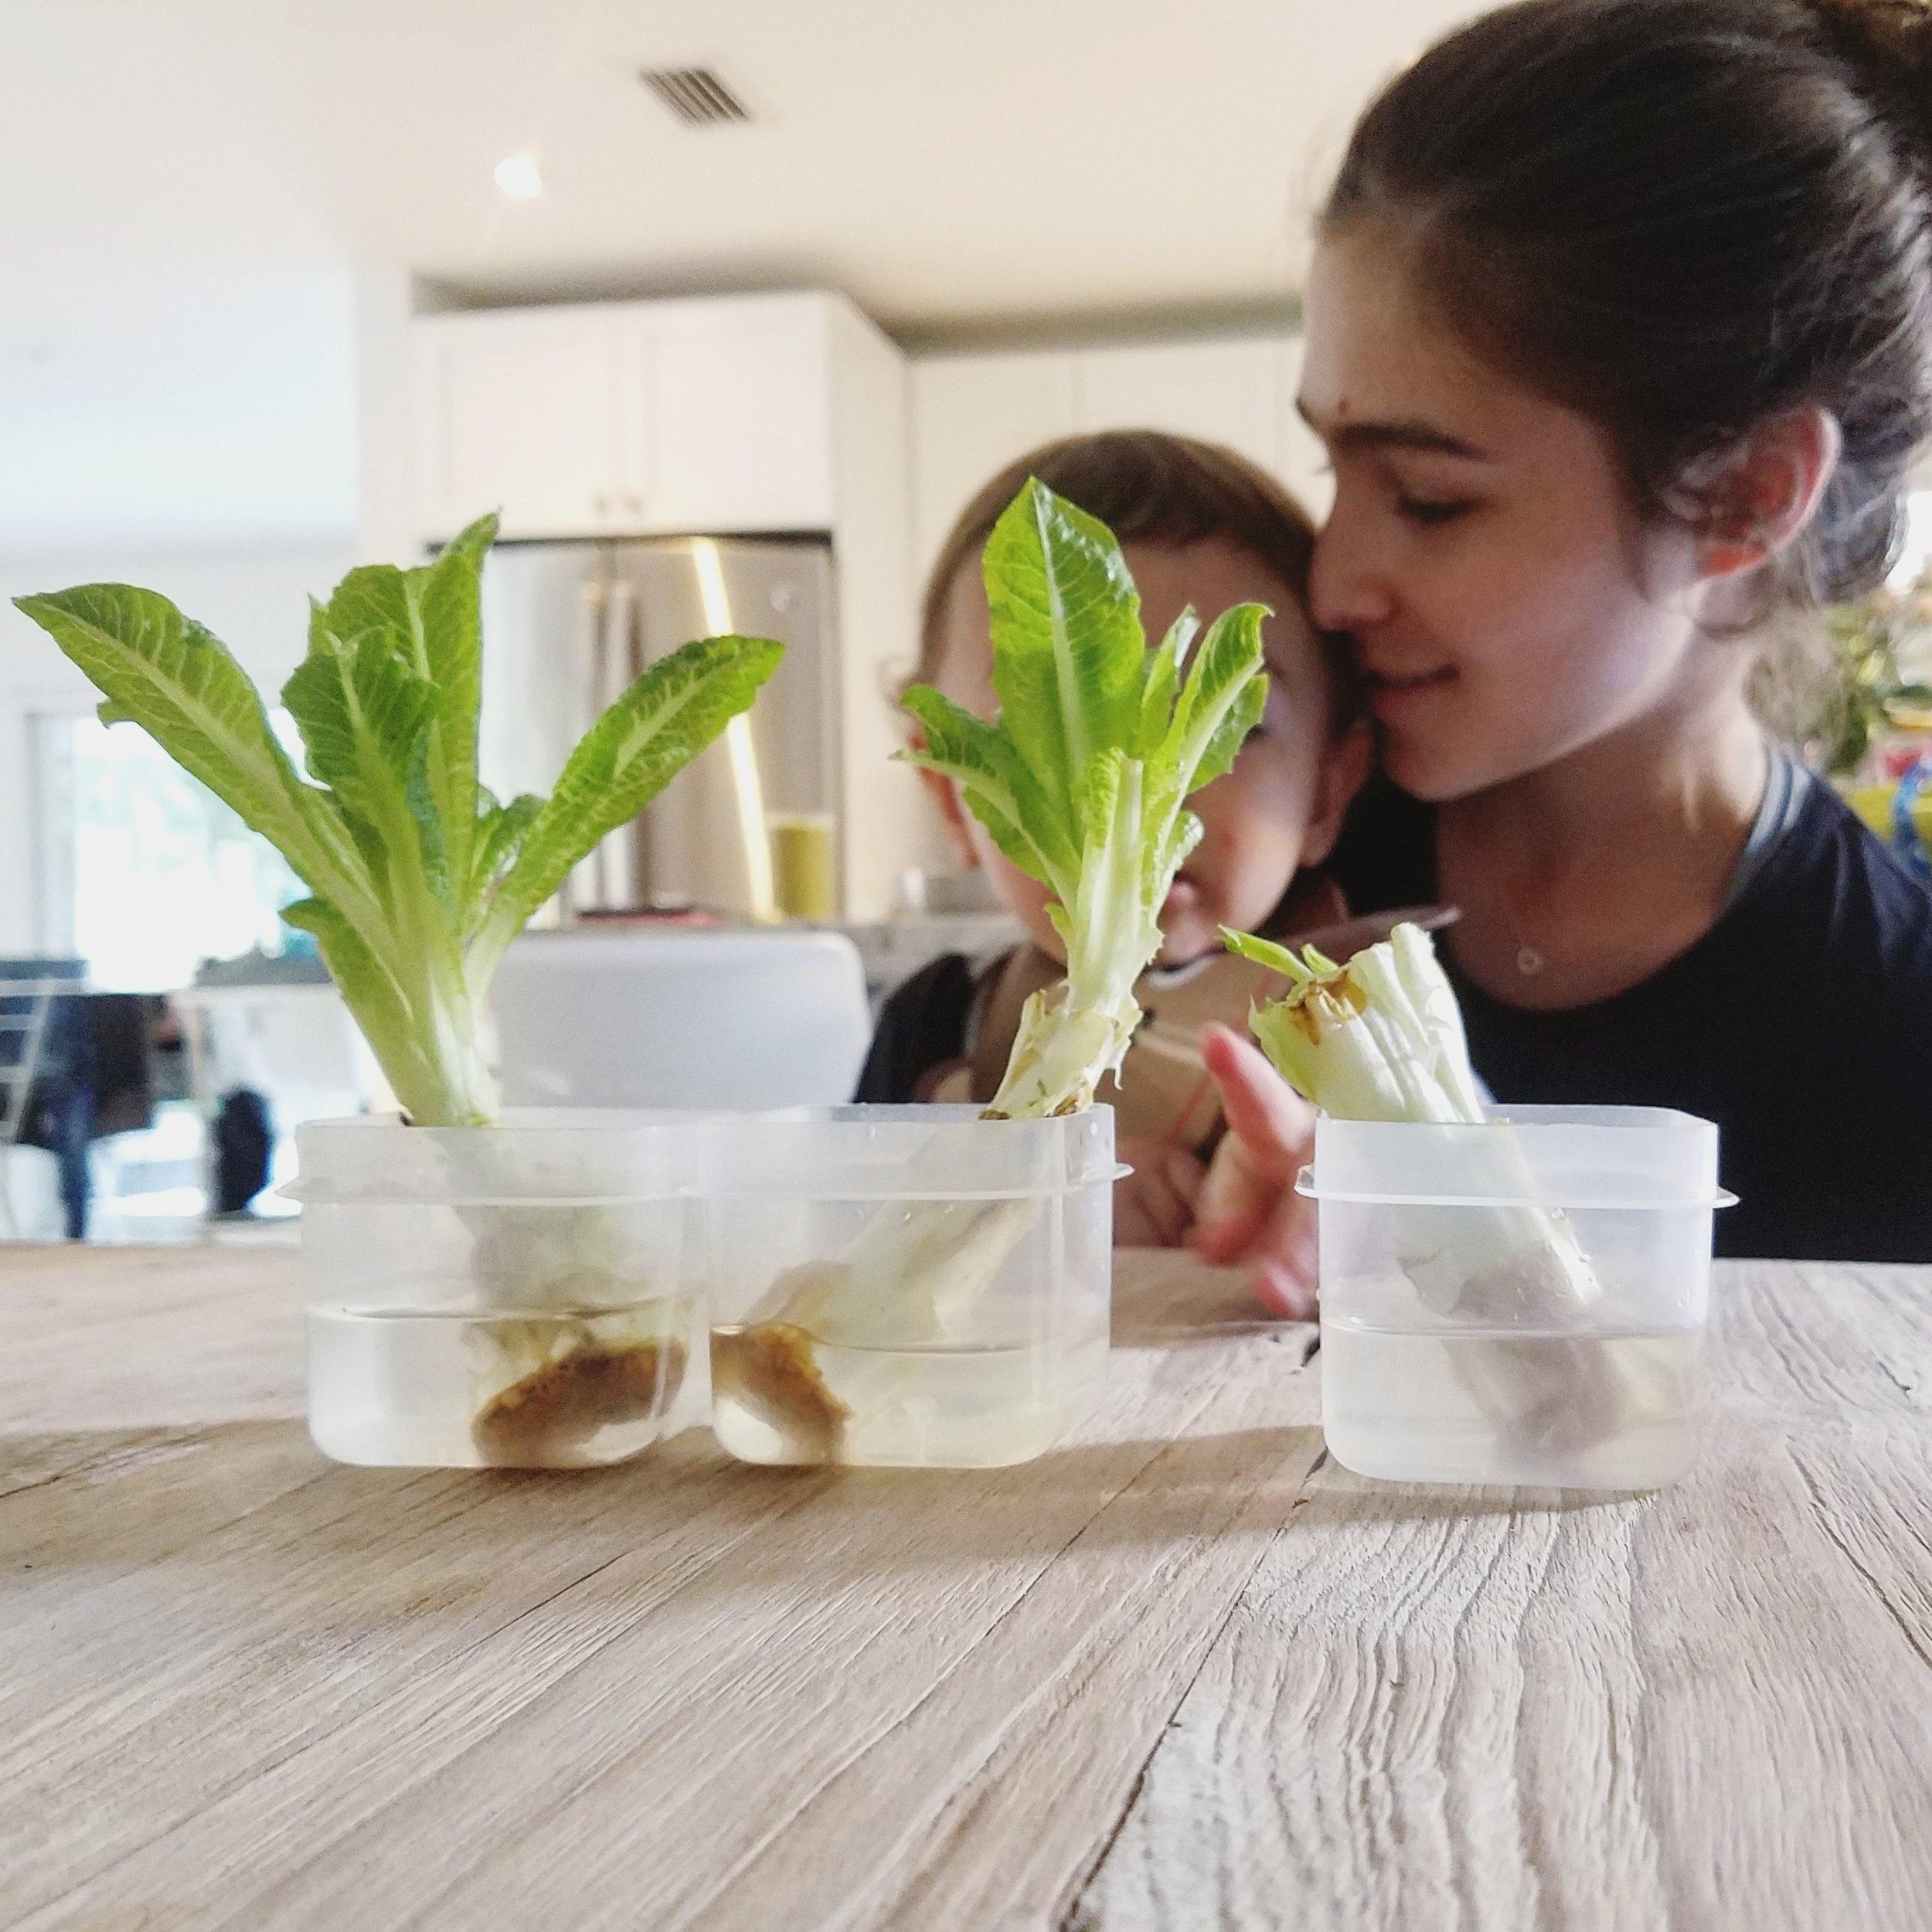 Regrowing romain lettuce from scraps